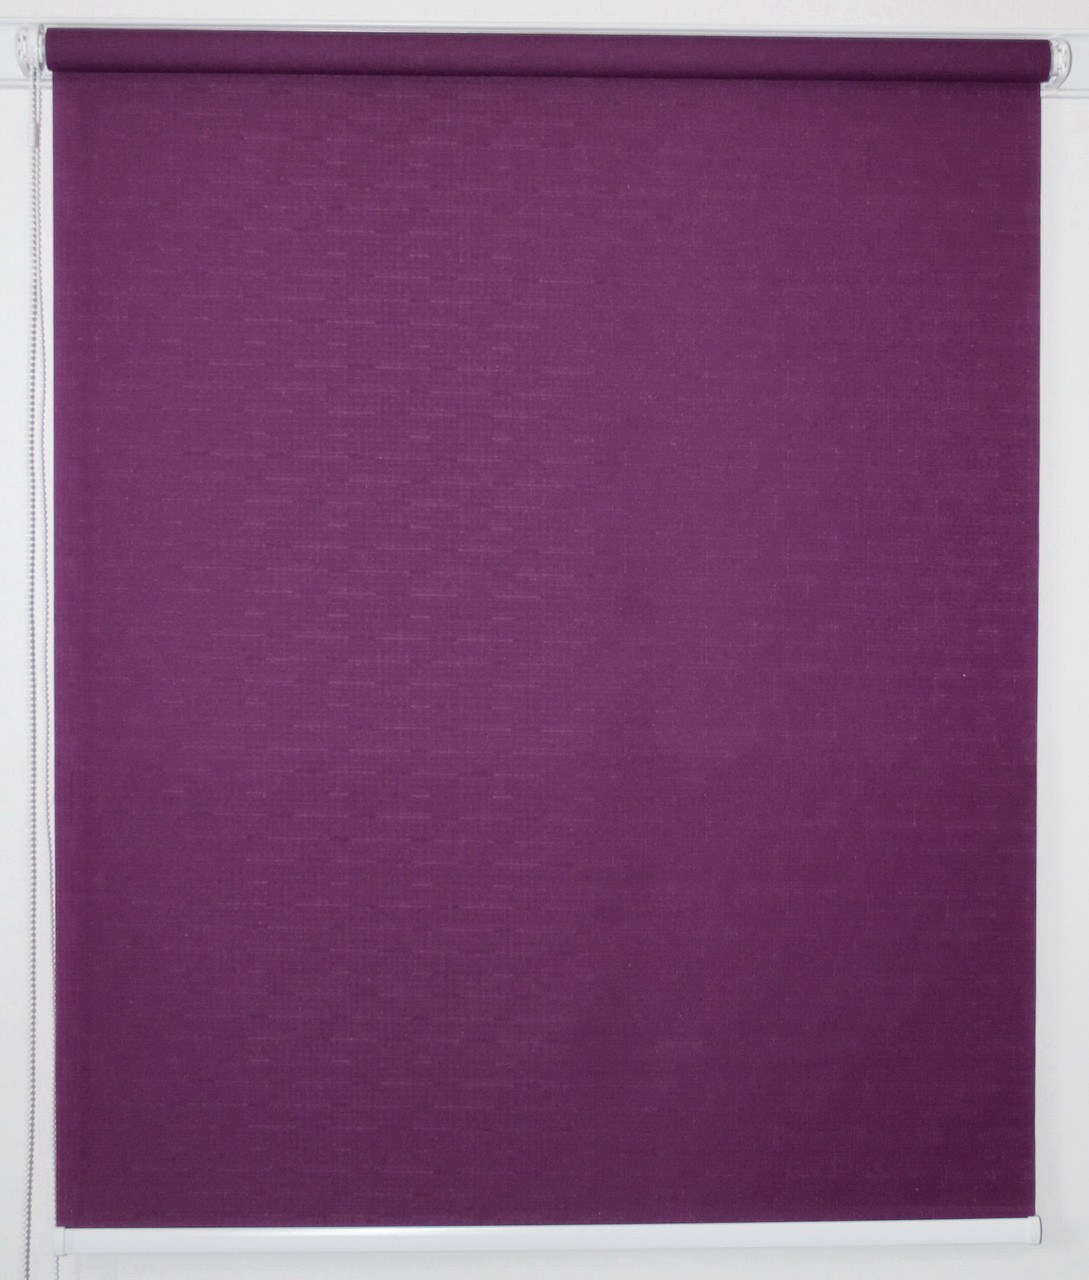 Рулонная штора 1150*1500 Лён 613 Фиолетовый